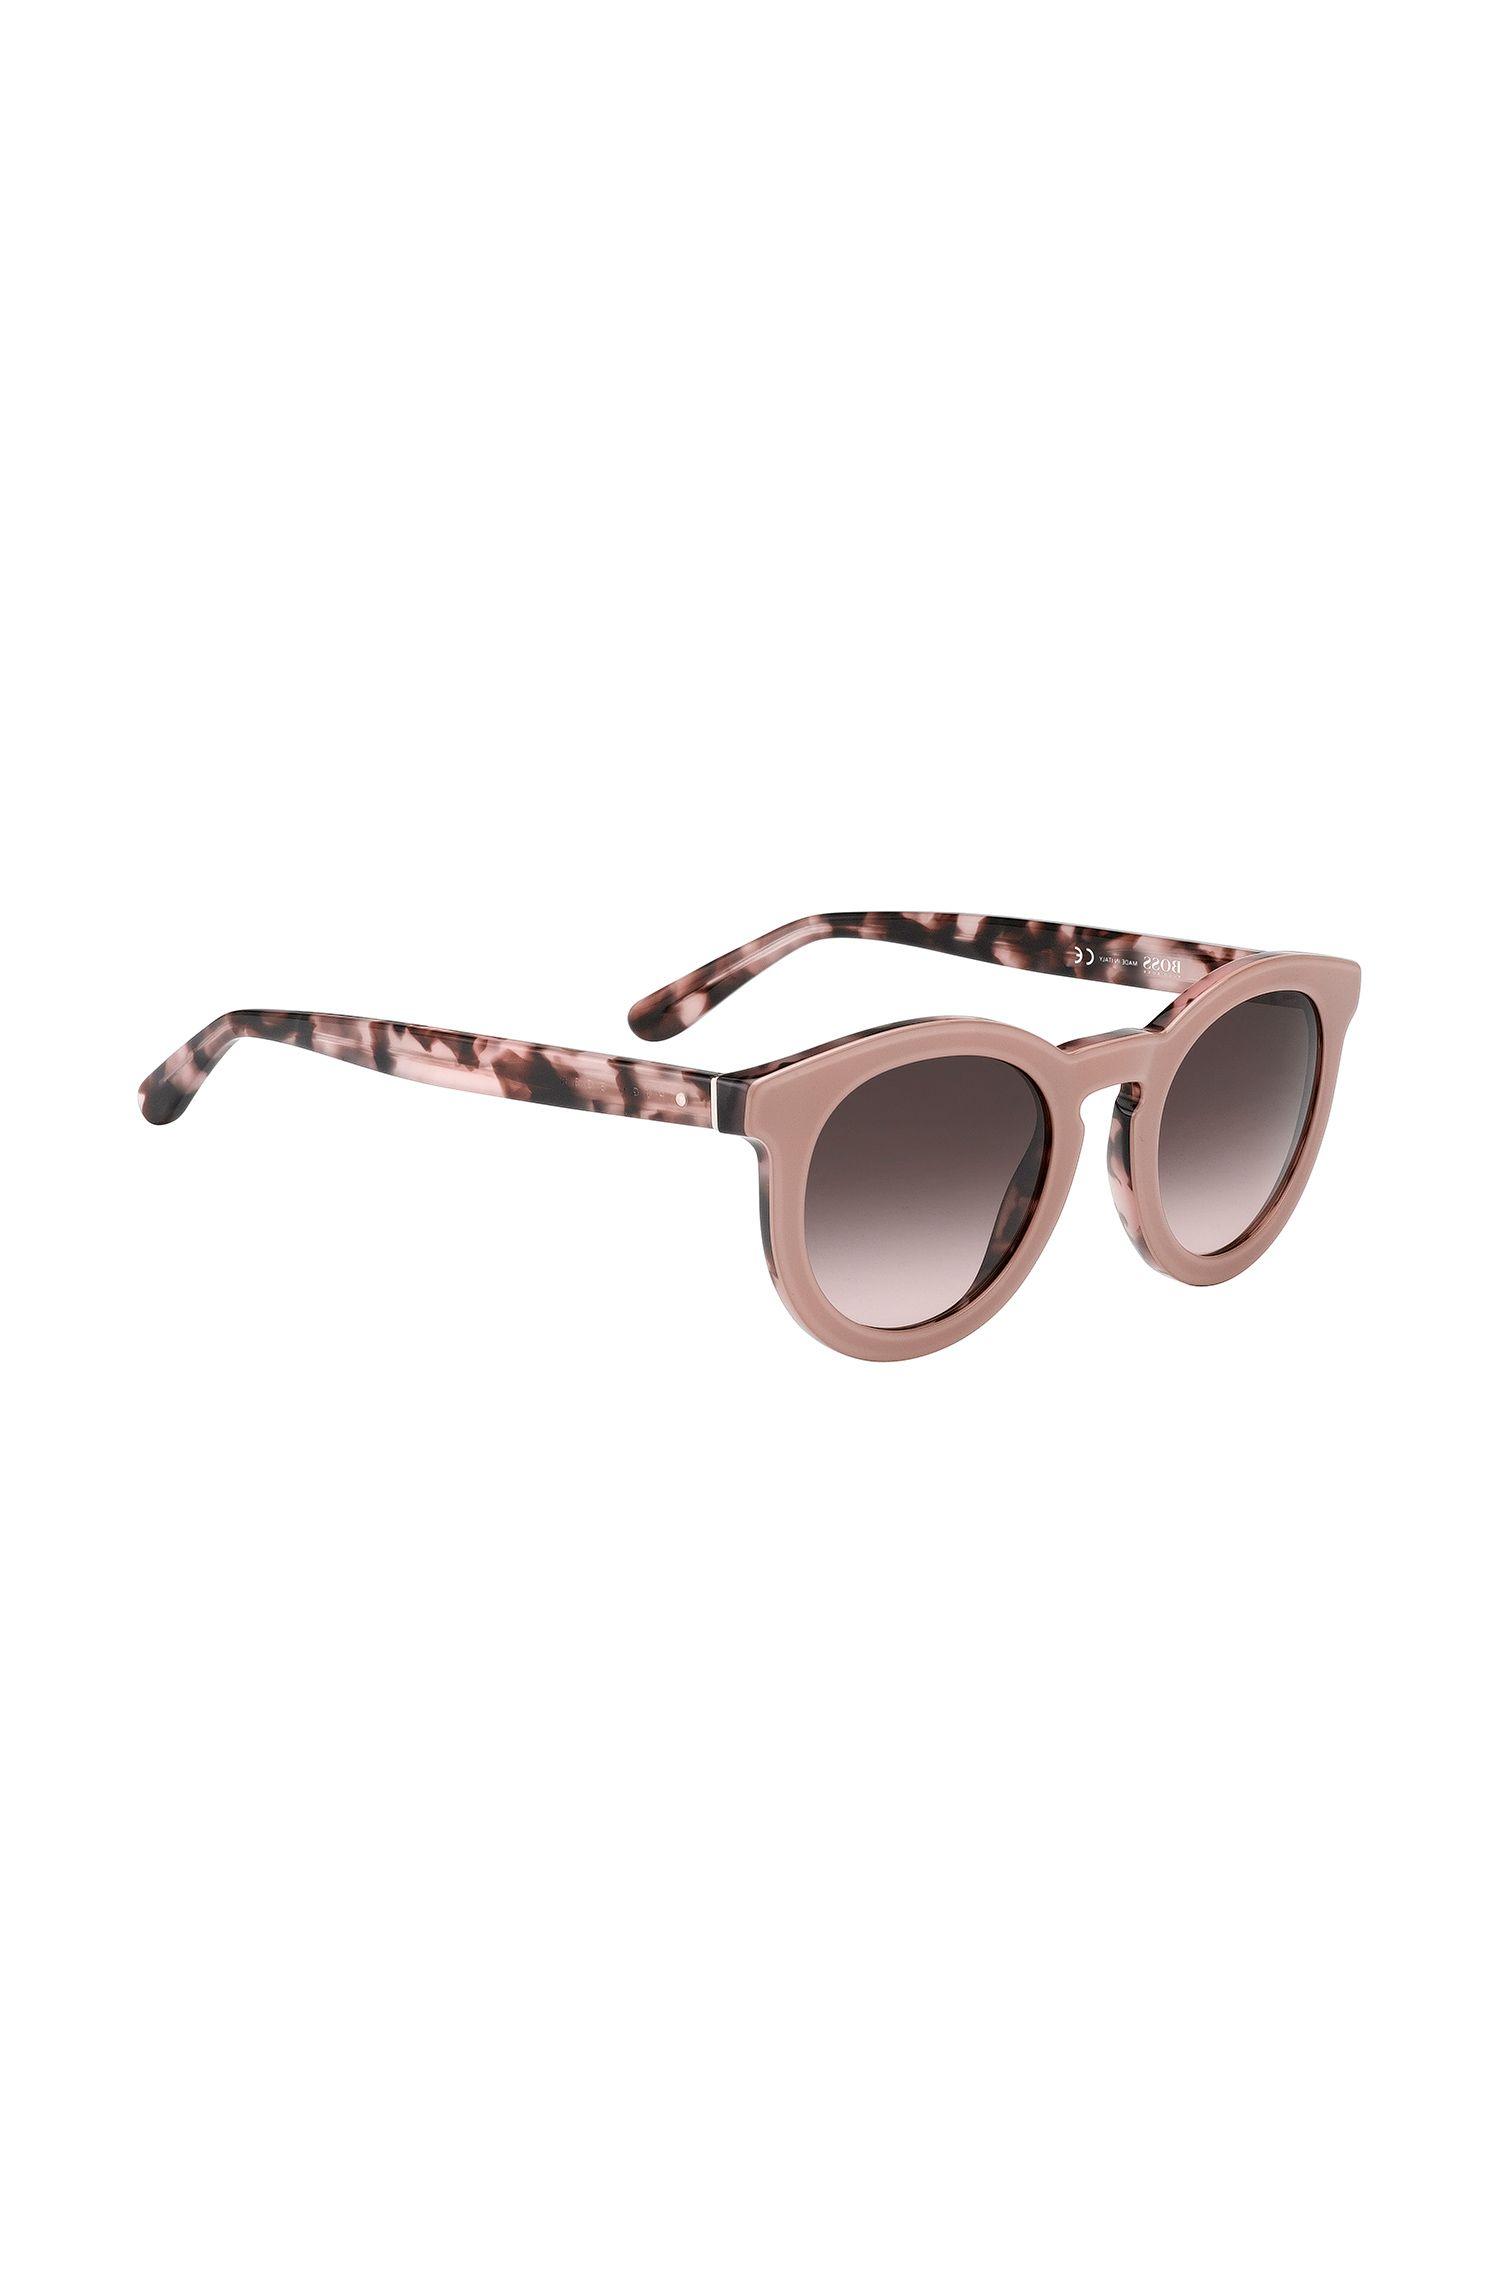 Sunglasses: 'BOSS 0742/S'